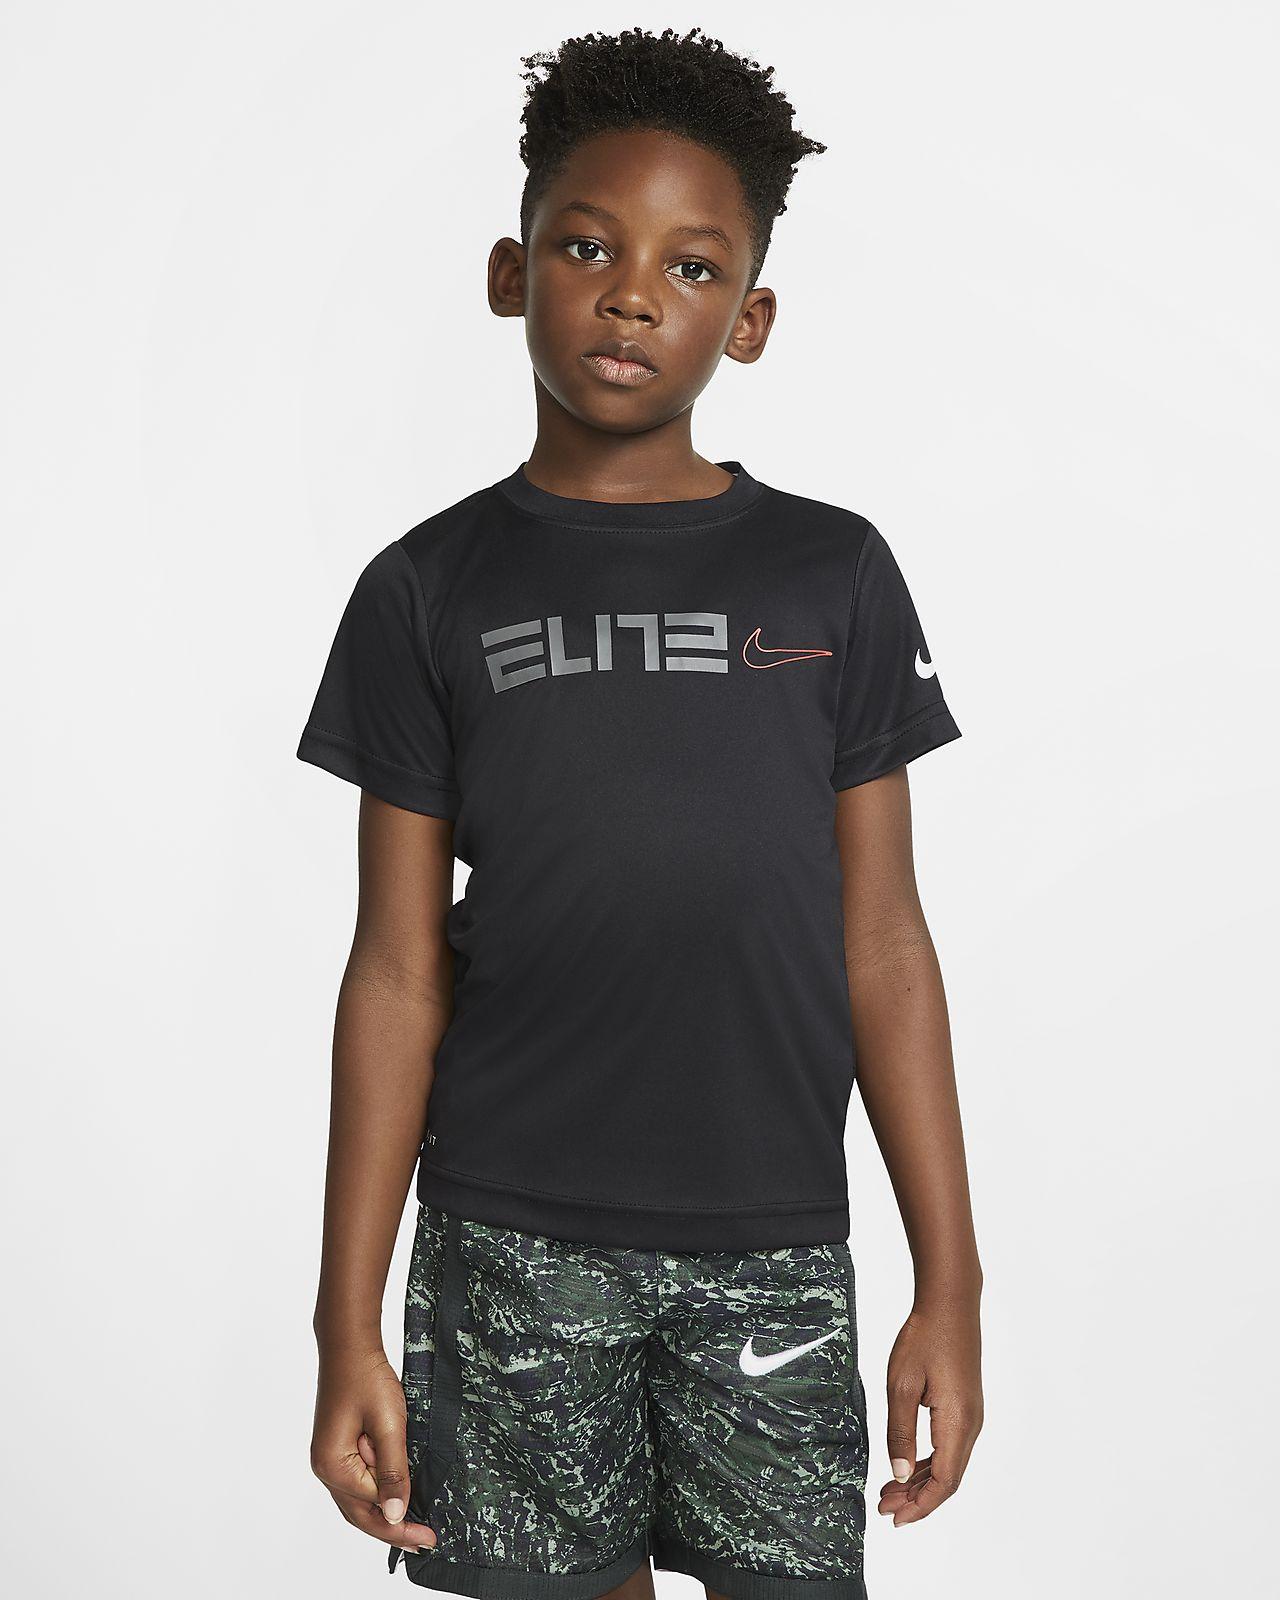 Nike Dri-FIT Elite Little Kids' Short-Sleeve T-Shirt